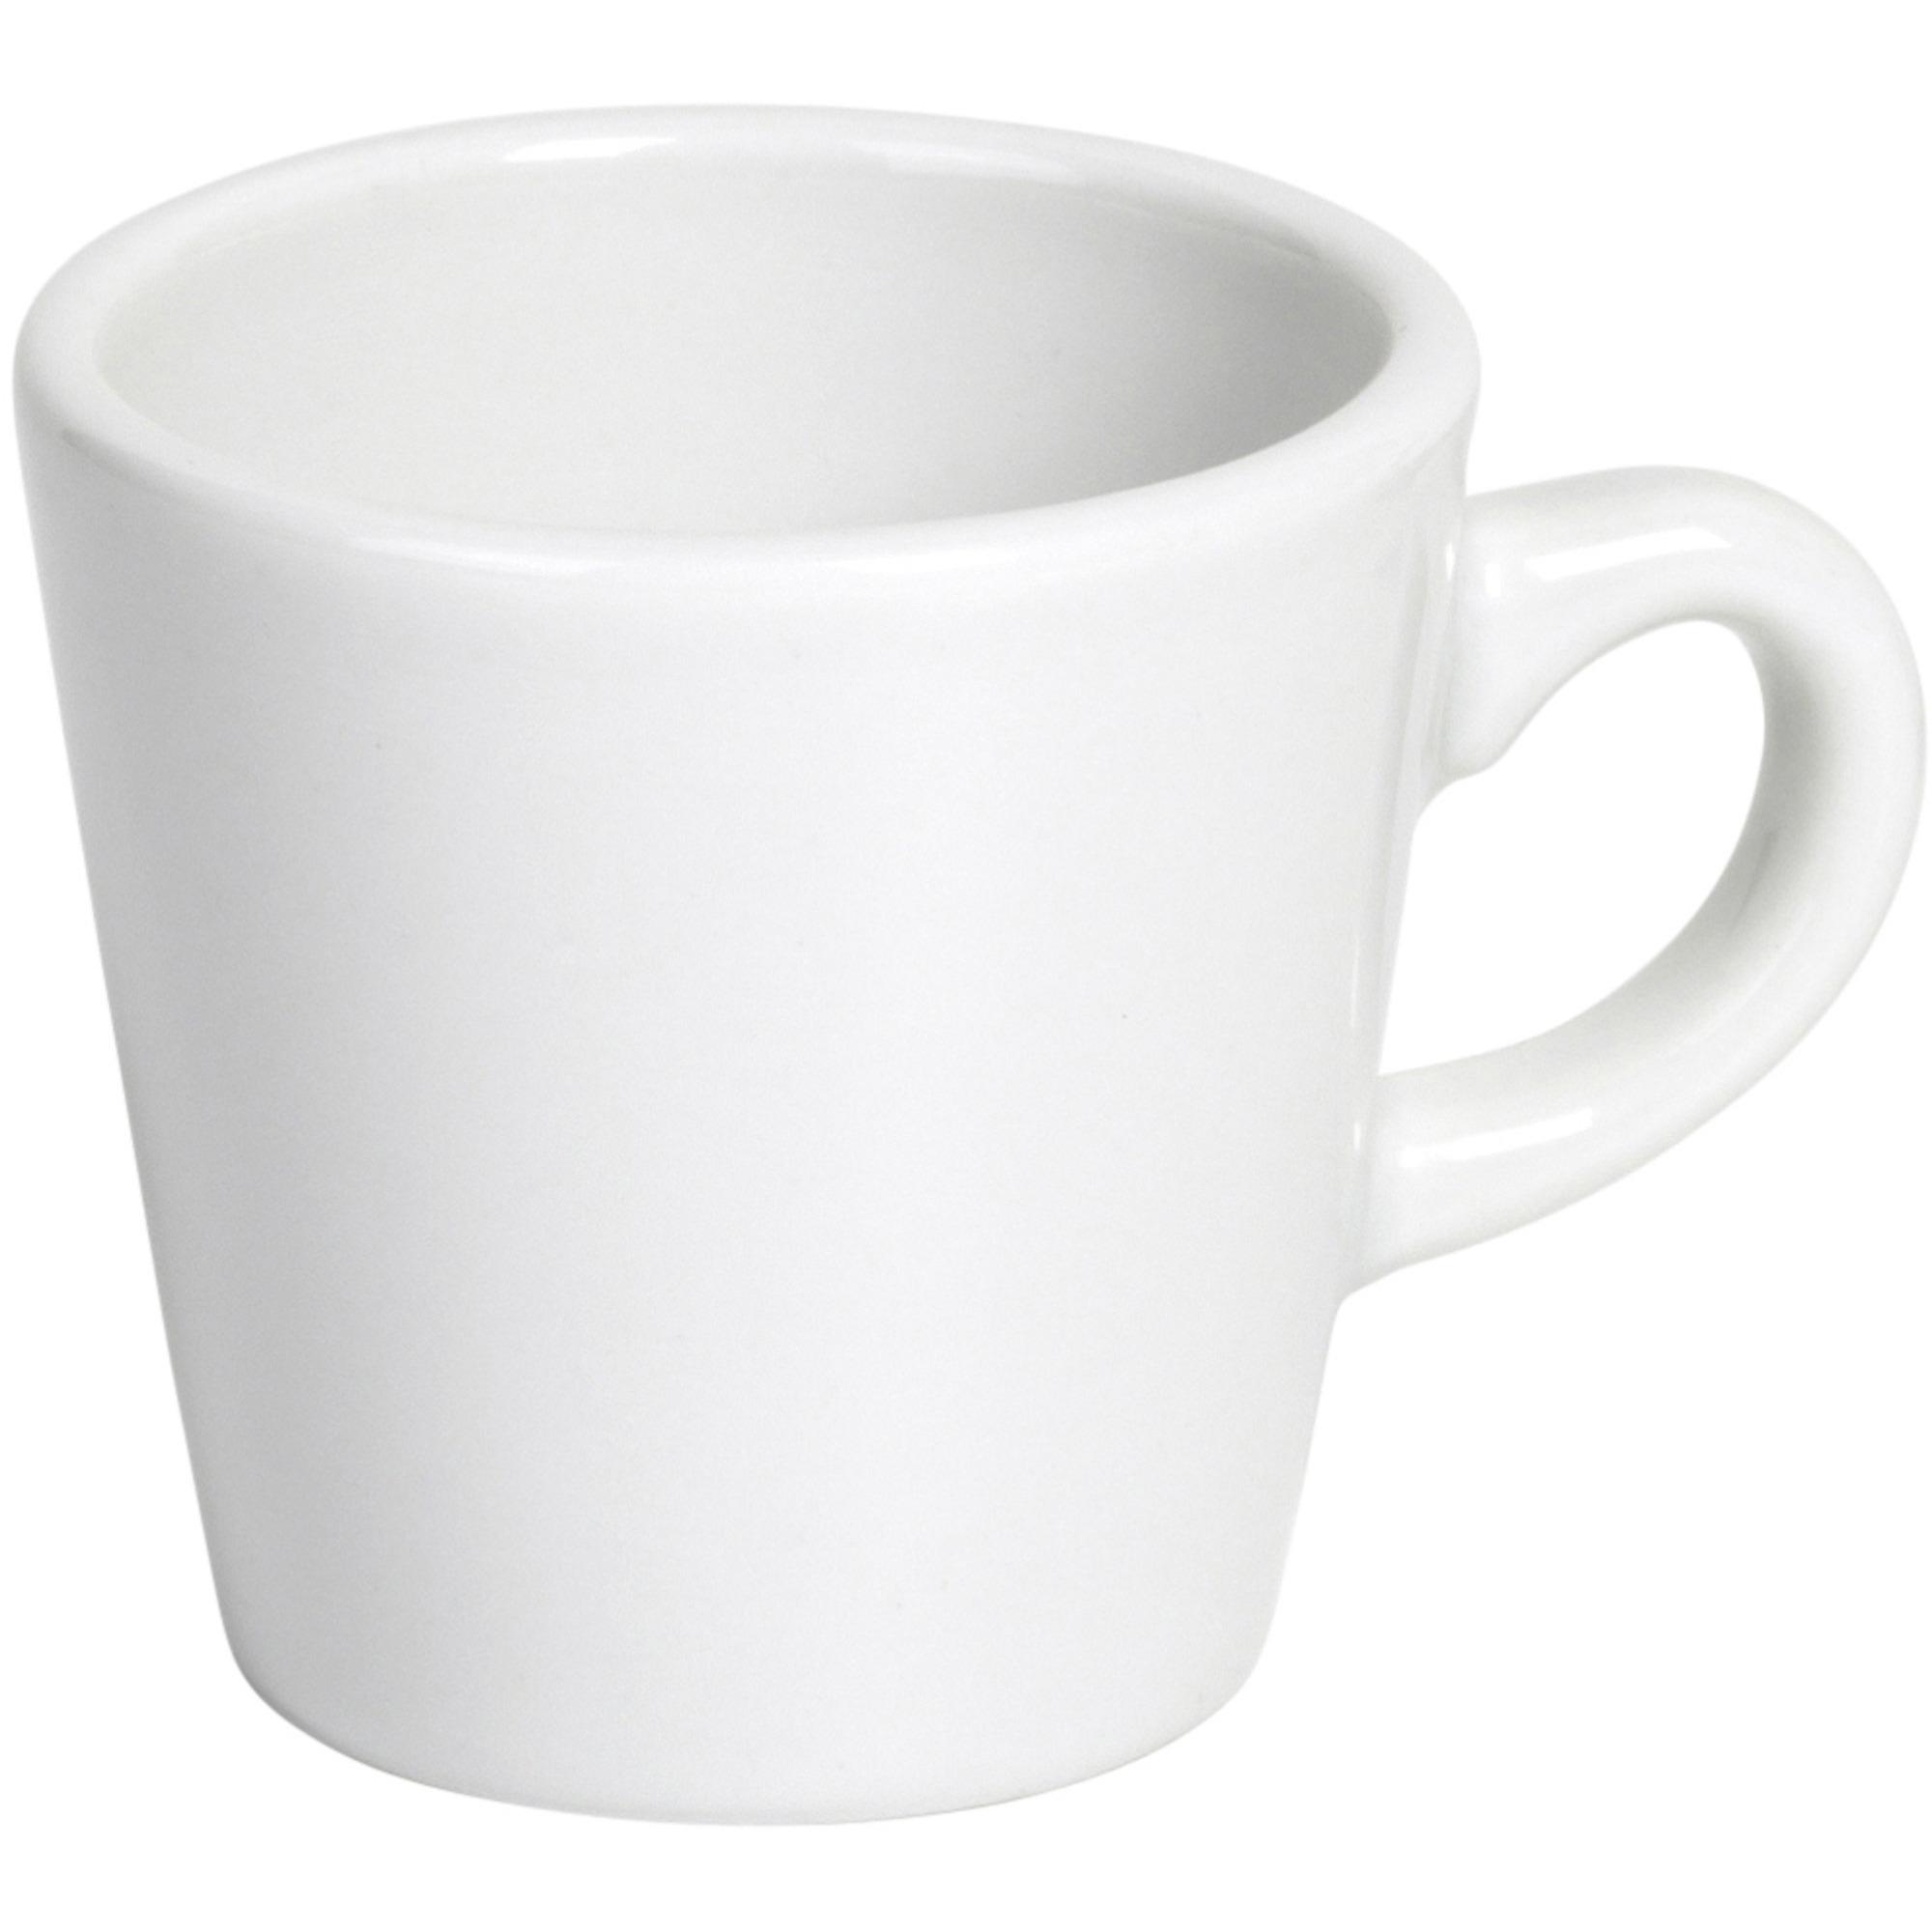 Pillivuyt Ristretto espressokopp